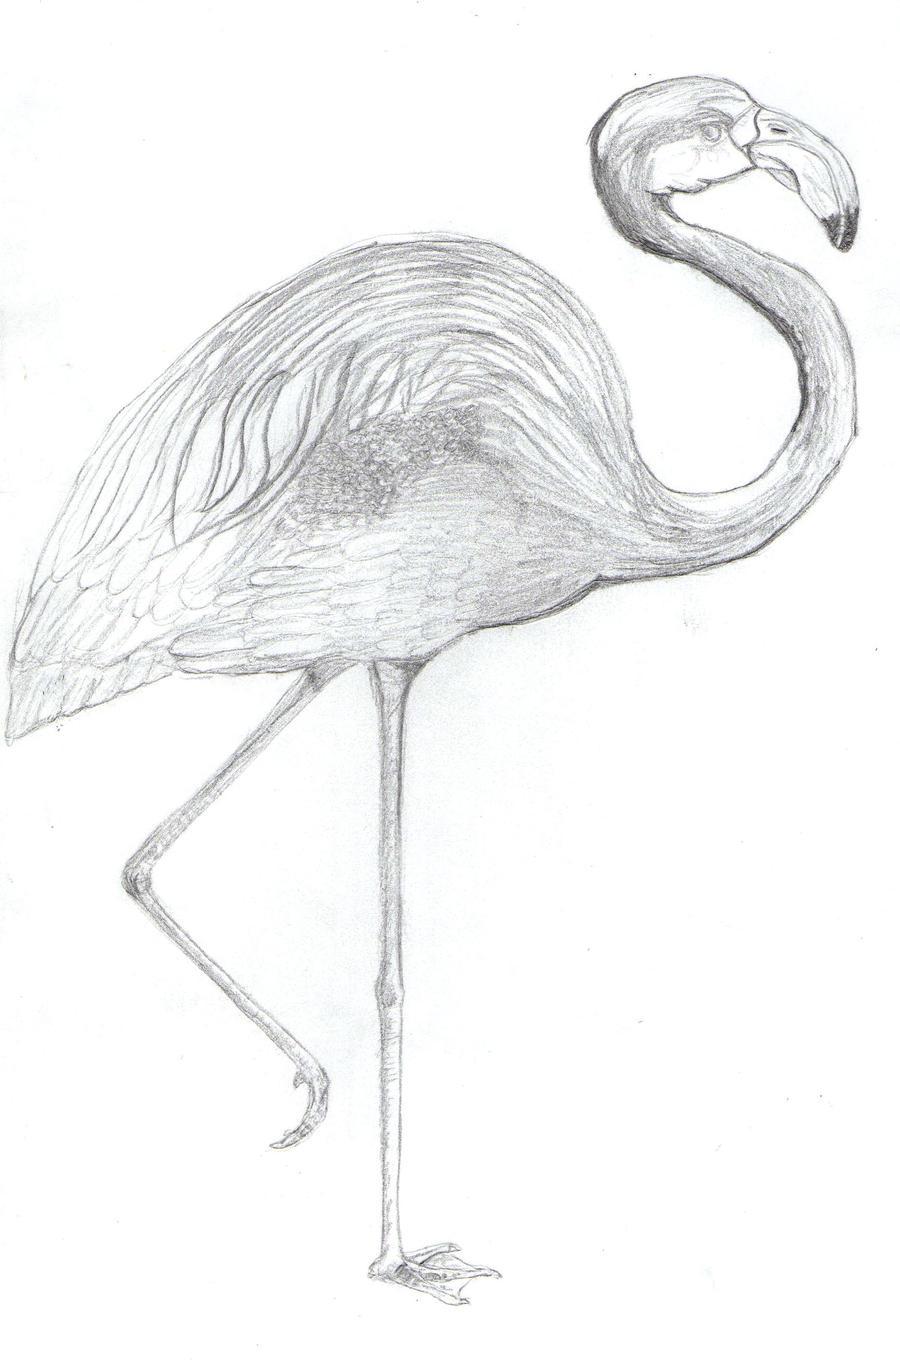 Flamingo pencil drawing